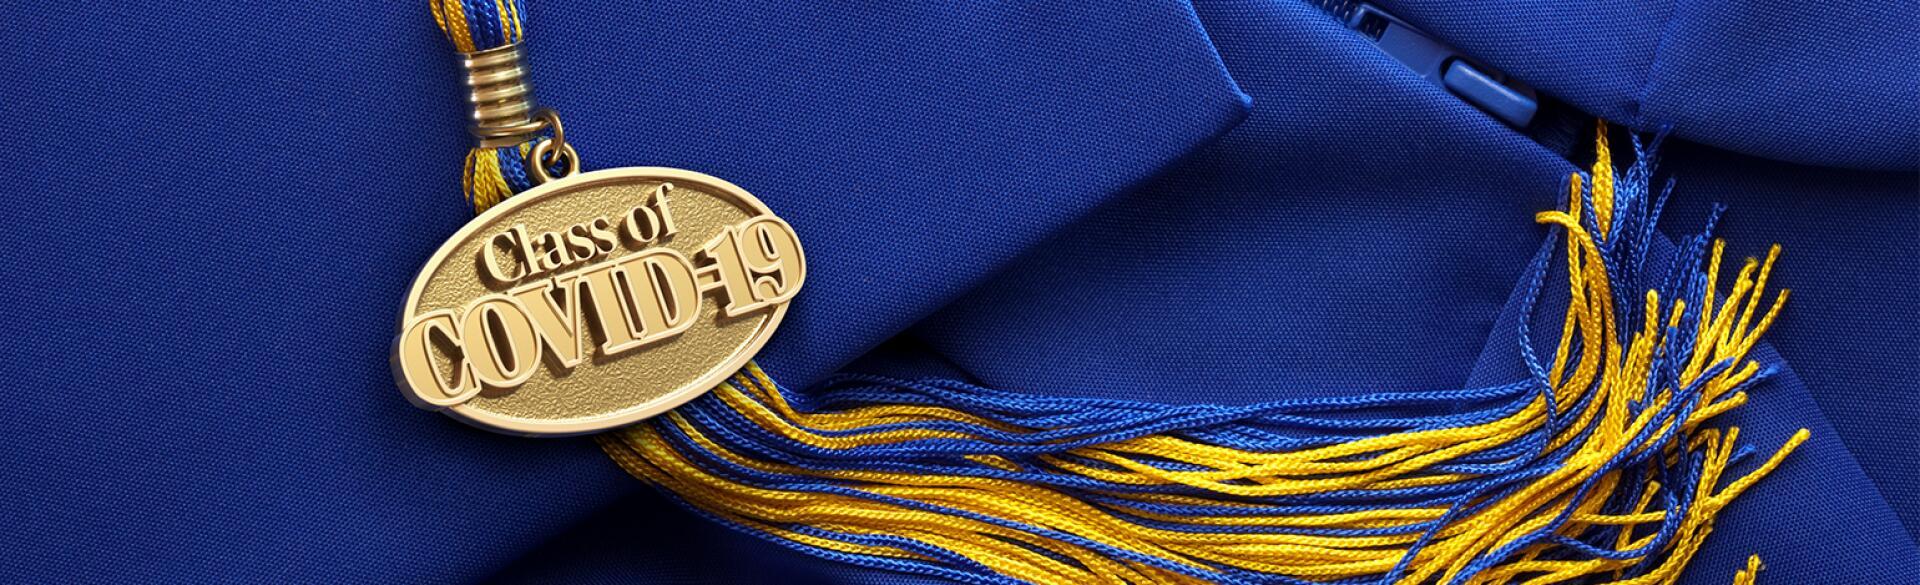 graduation_and_coronavirus_by_chris_o'riley_1540x600.jpg